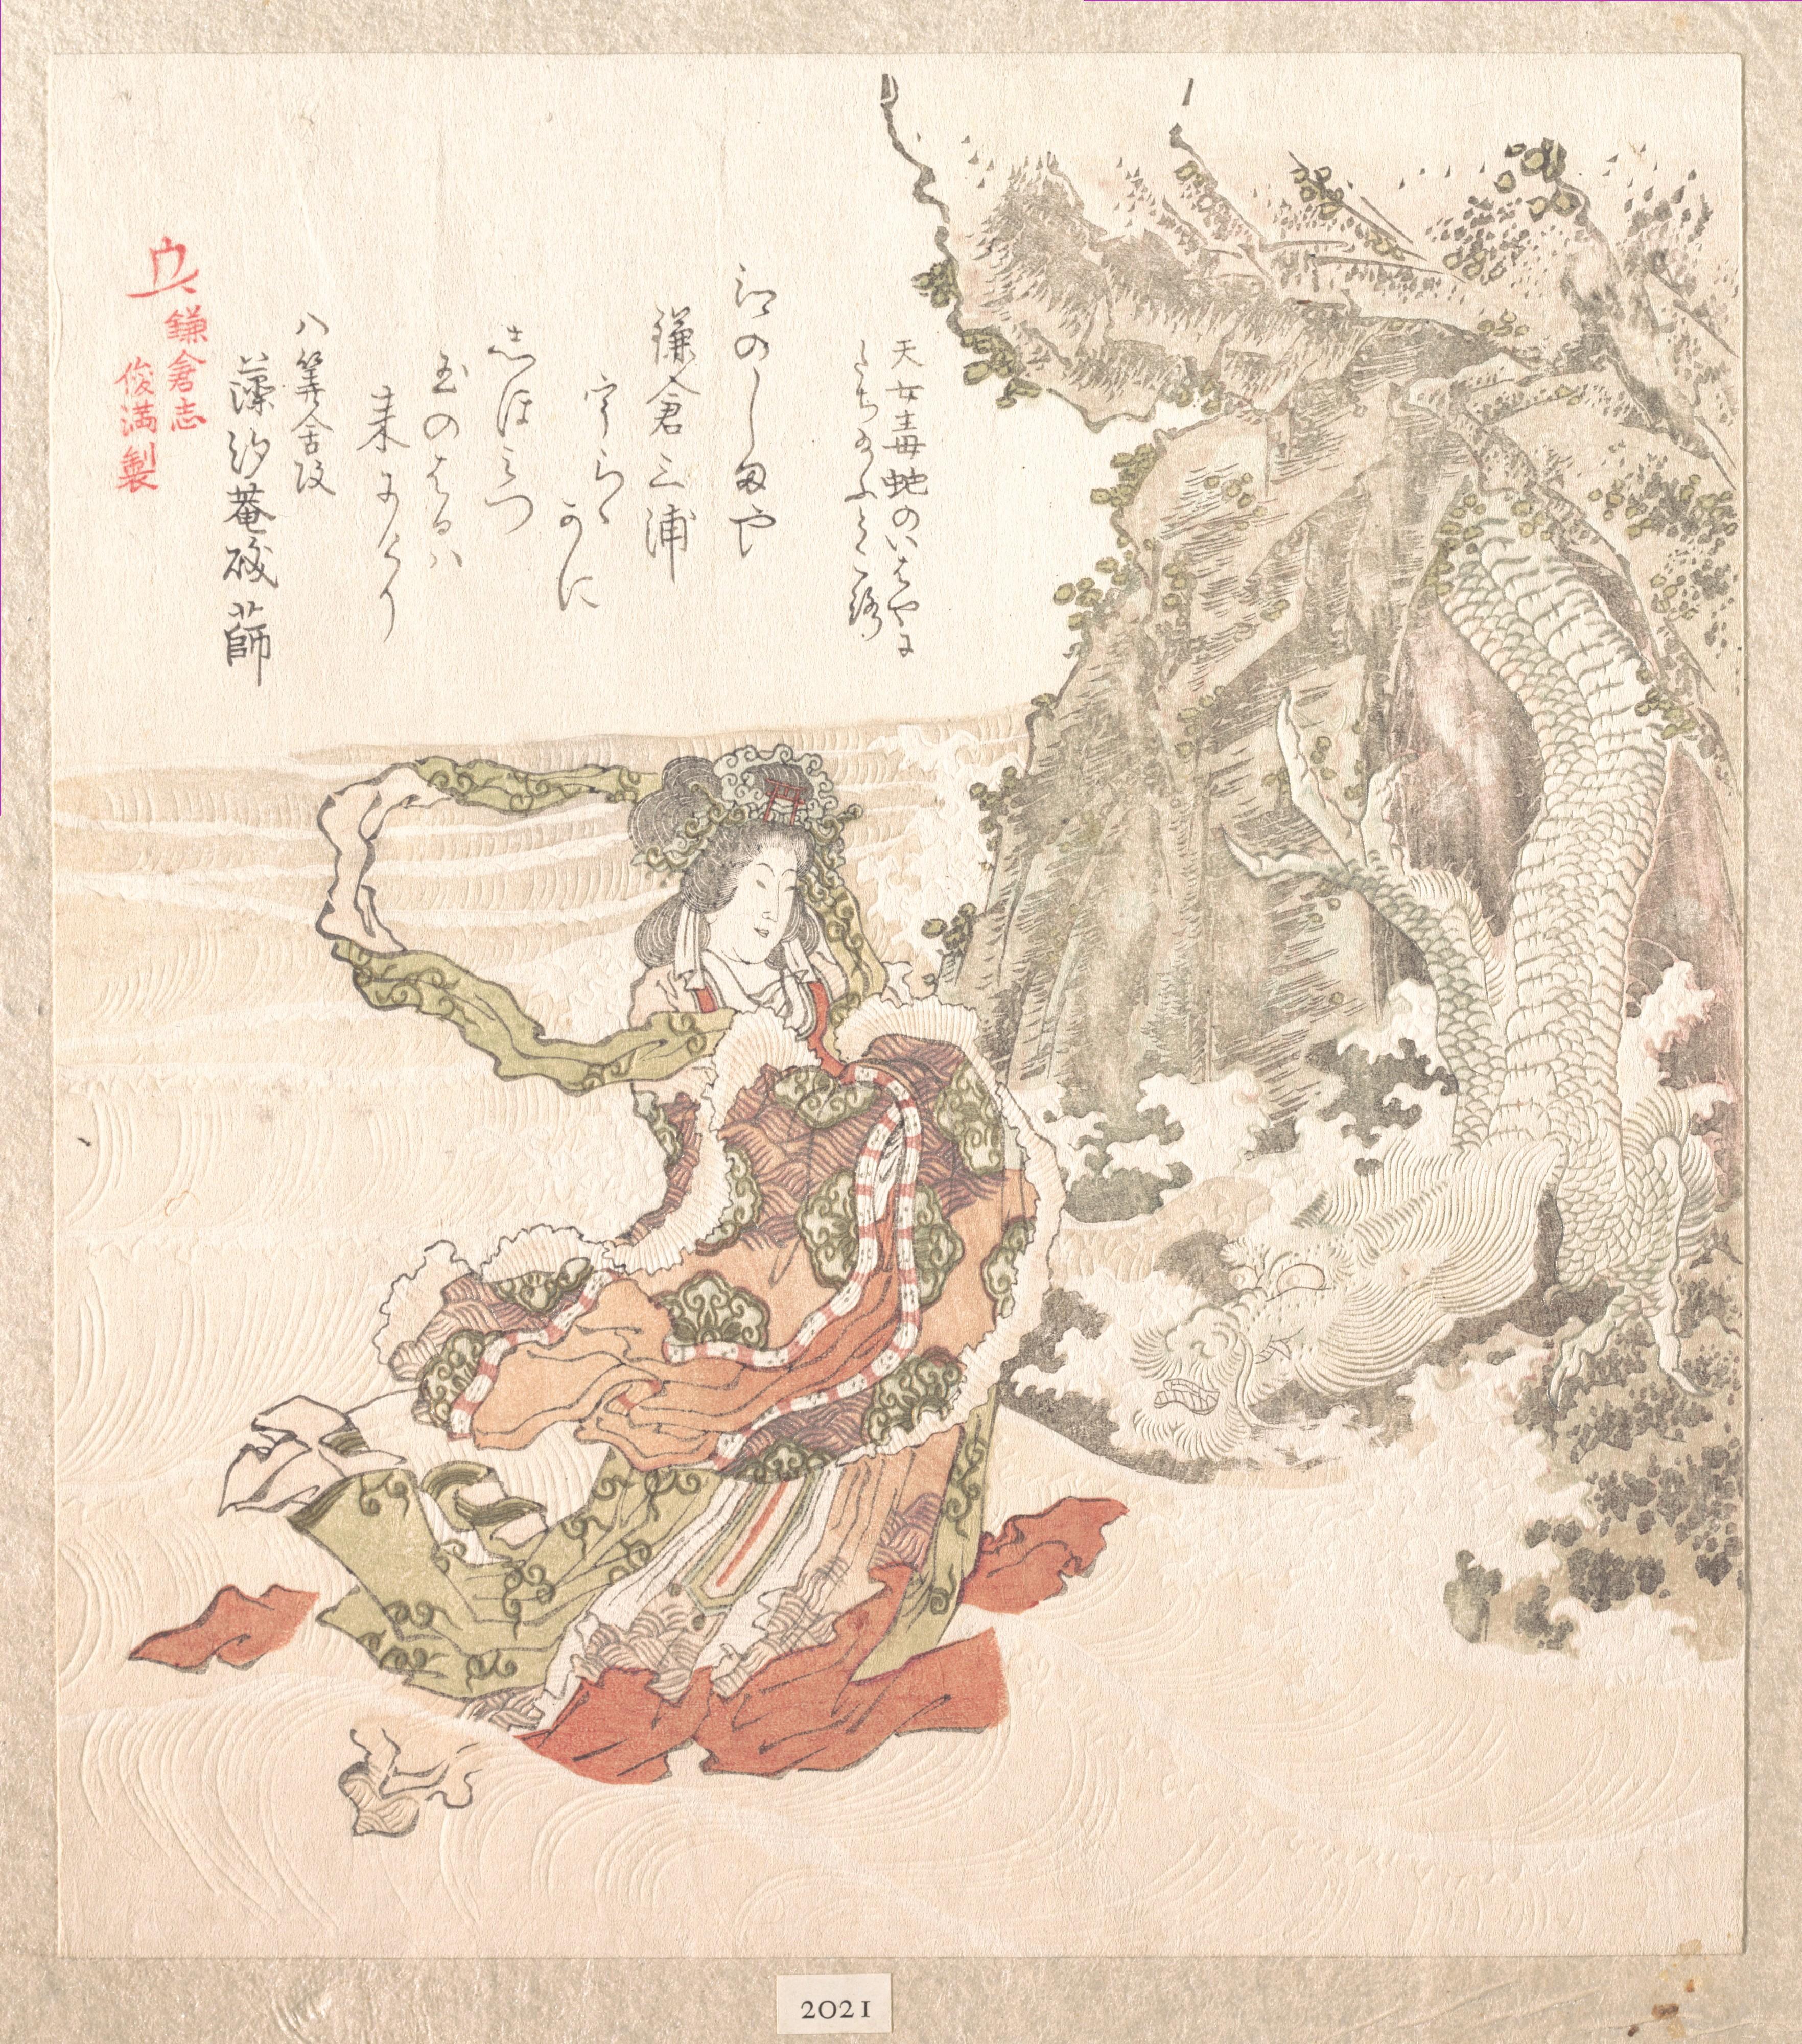 История Камакура_210х184 мм (2)